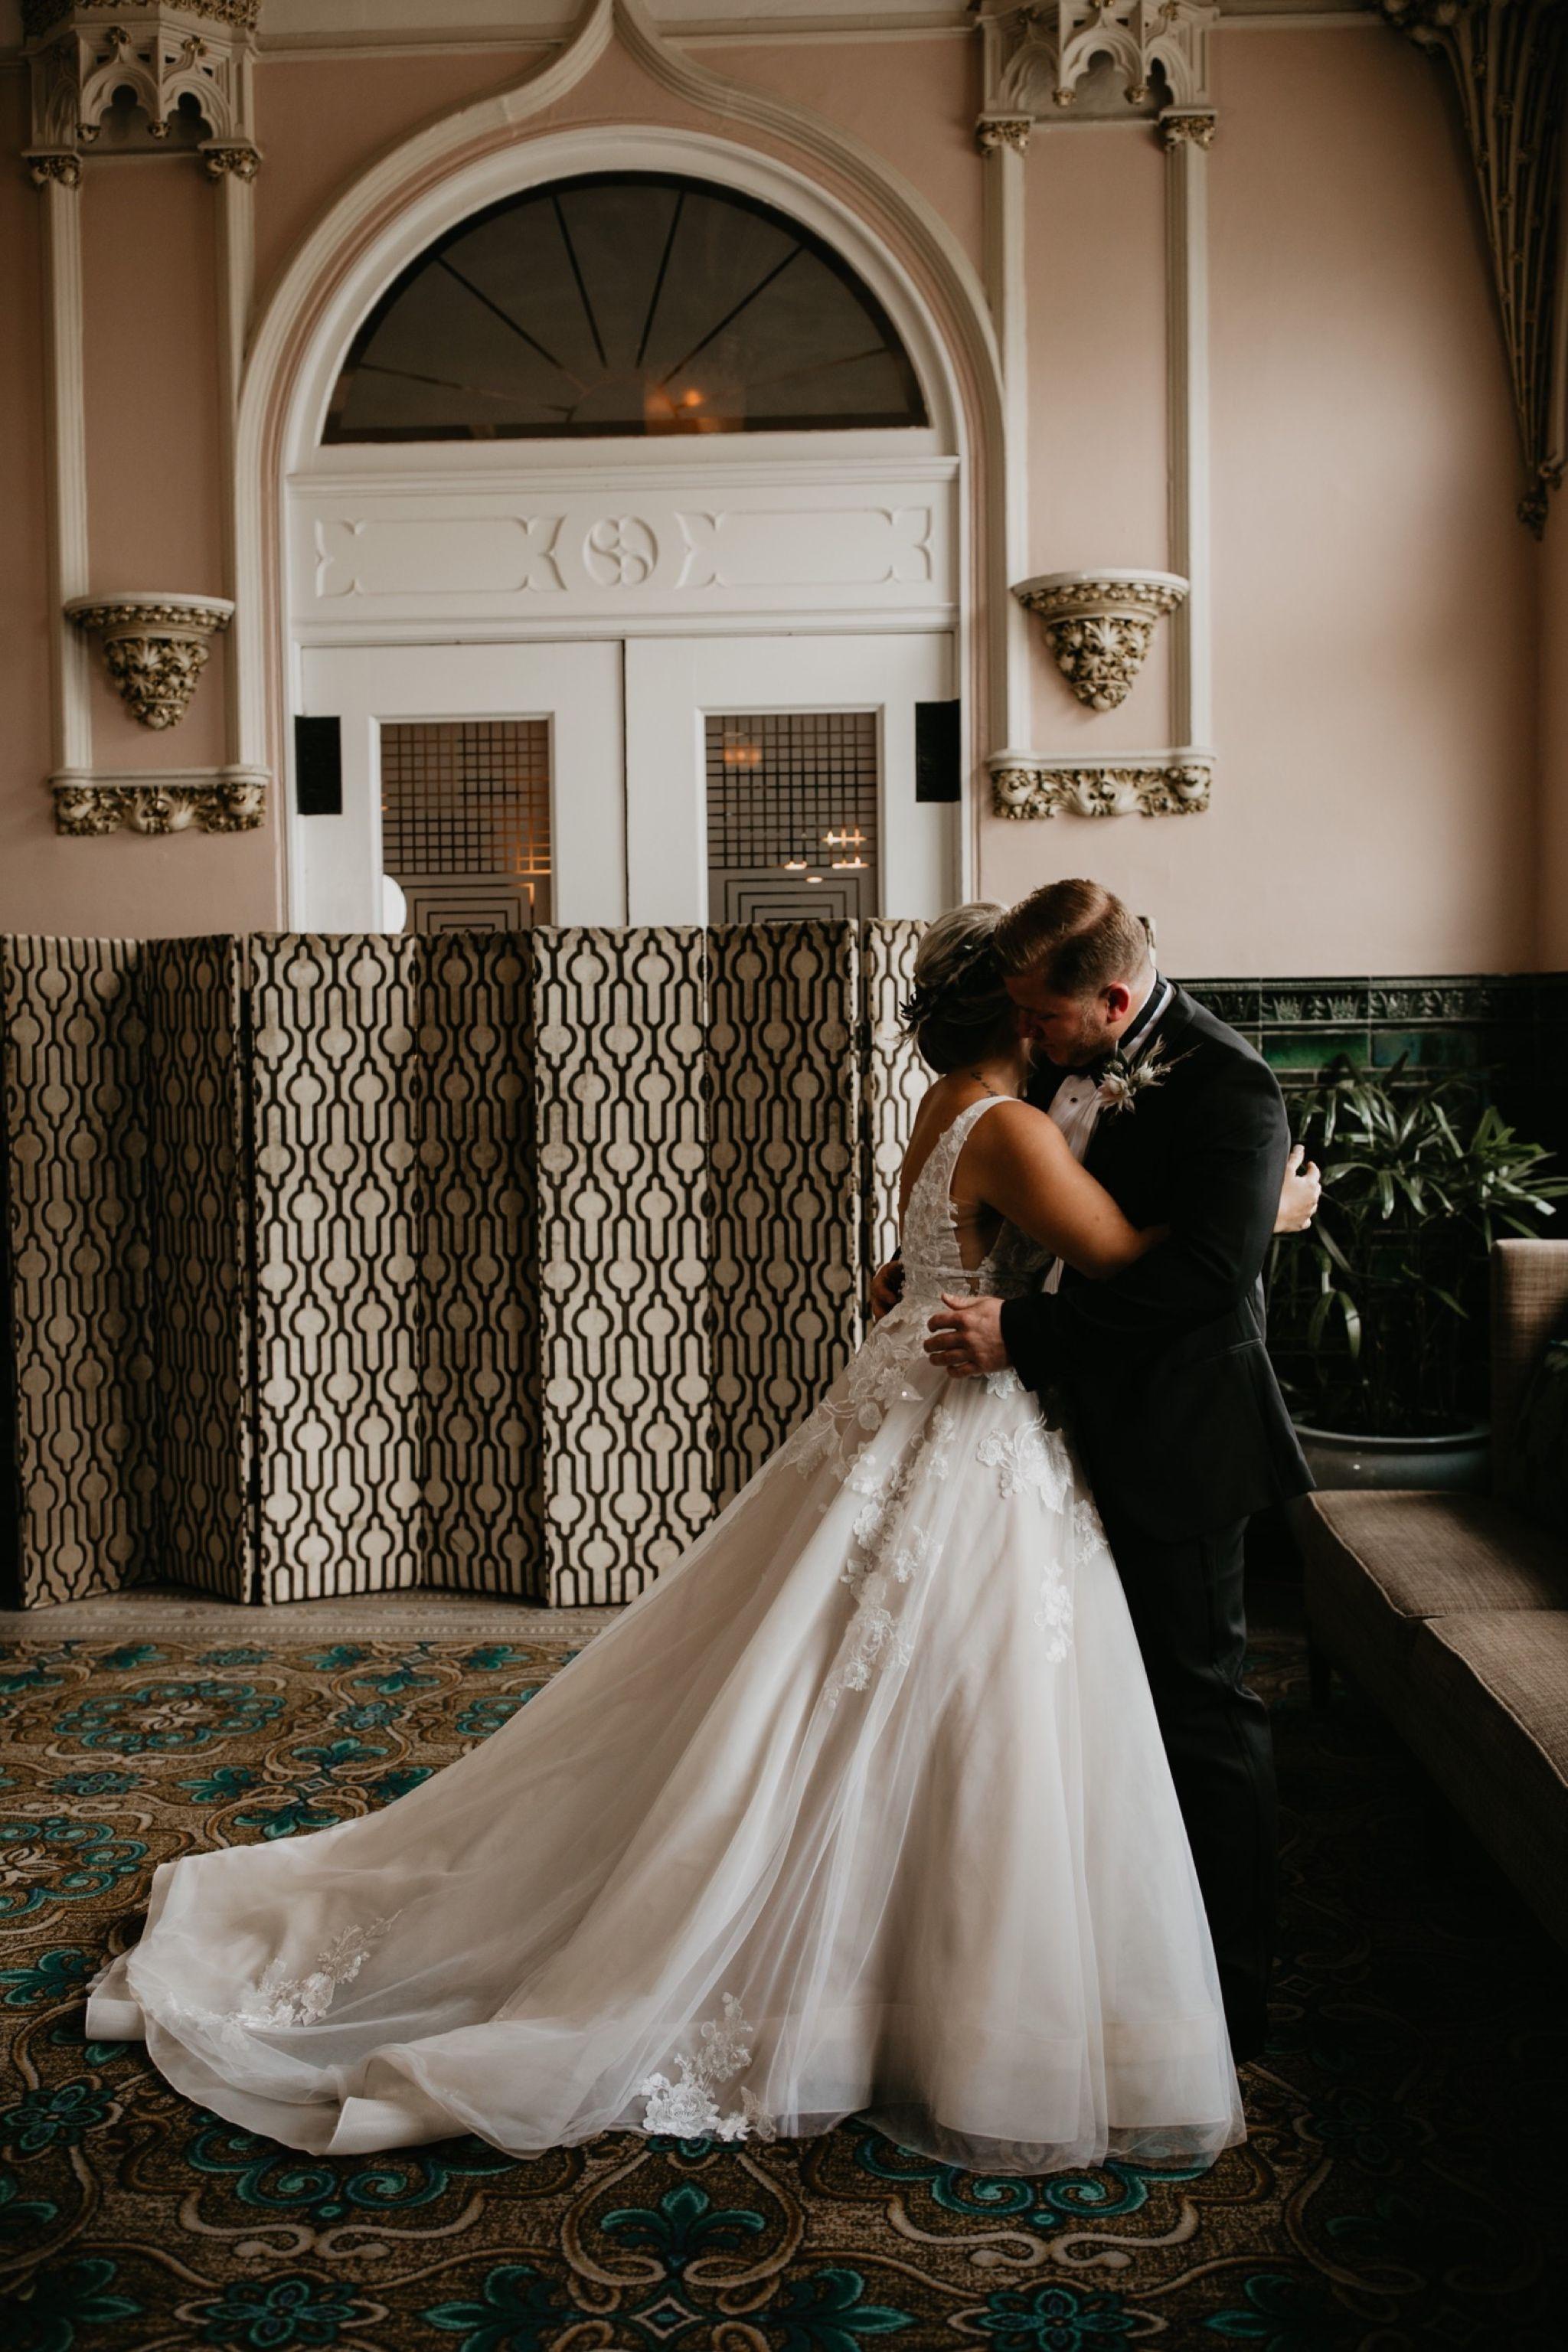 26++ Rooftop wedding venues in little rock ar information